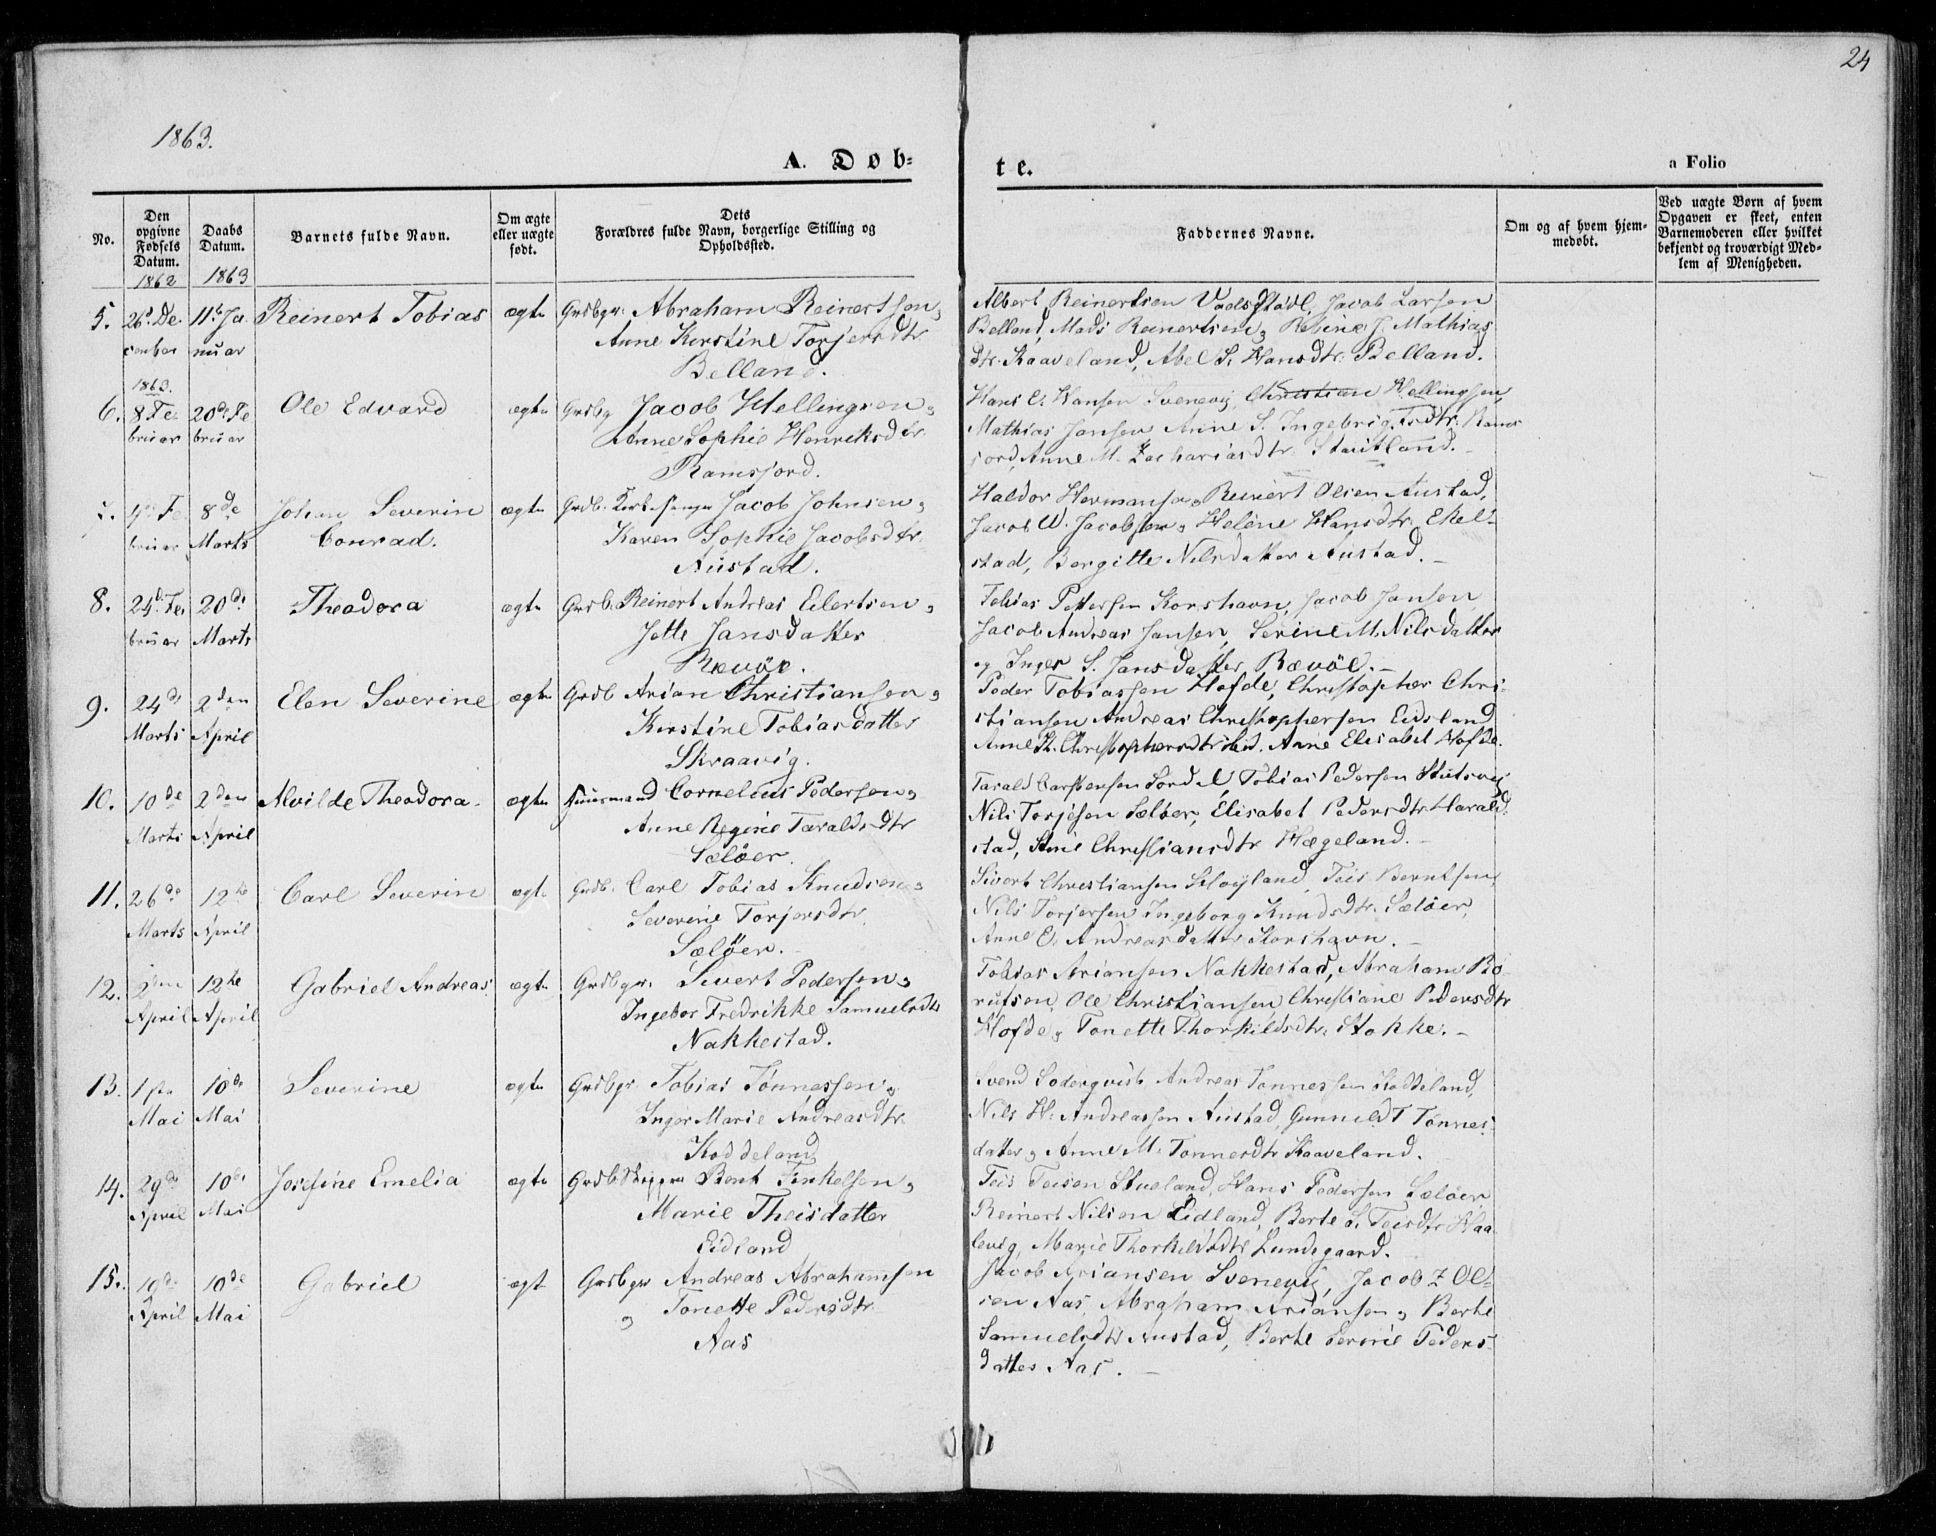 SAK, Lyngdal sokneprestkontor, F/Fa/Faa/L0002: Ministerialbok nr. A 2, 1858-1870, s. 24